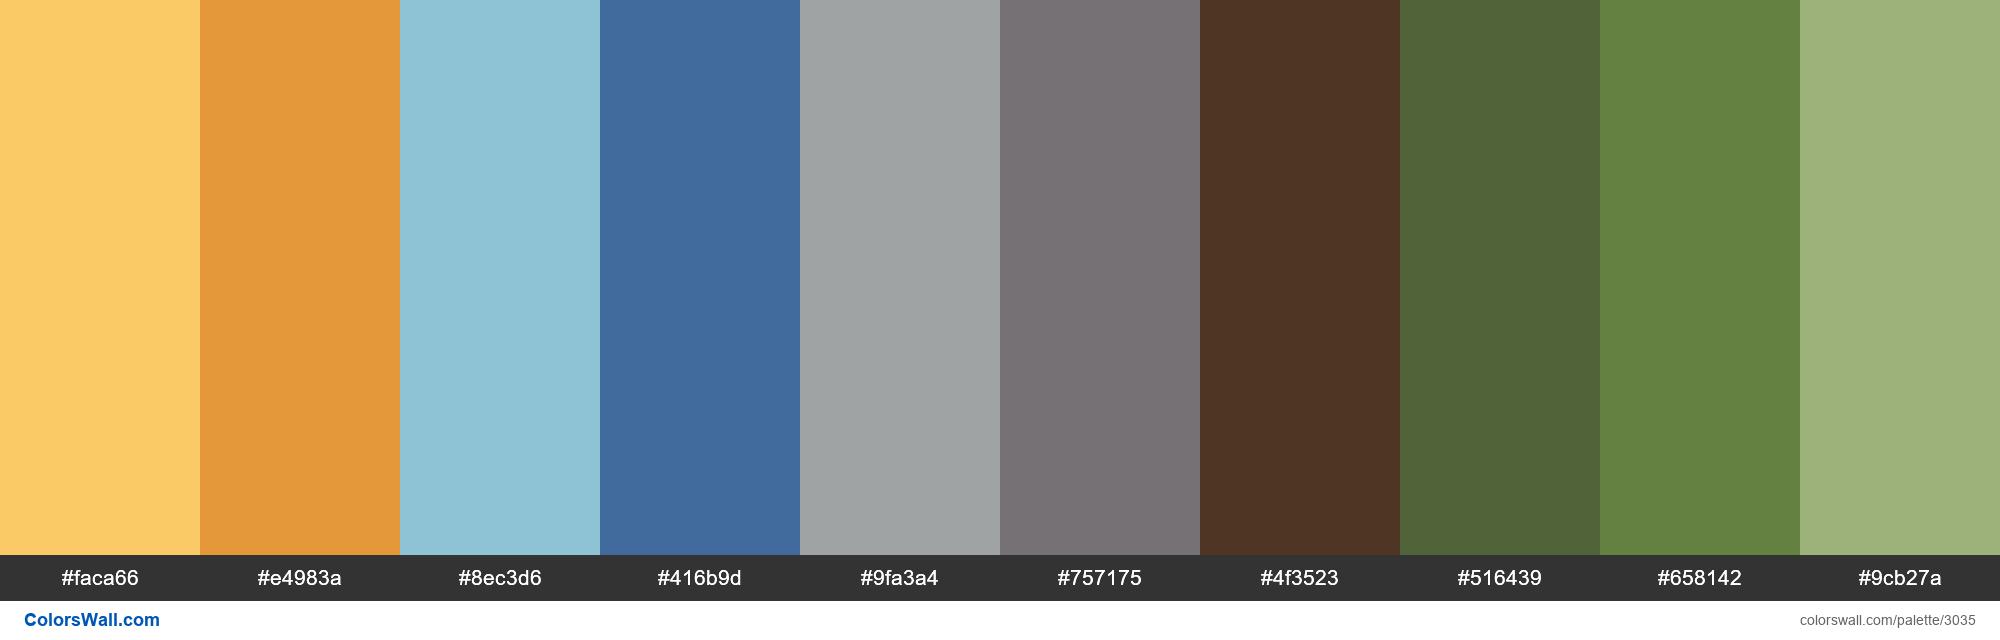 PEPFAR palette - #3035